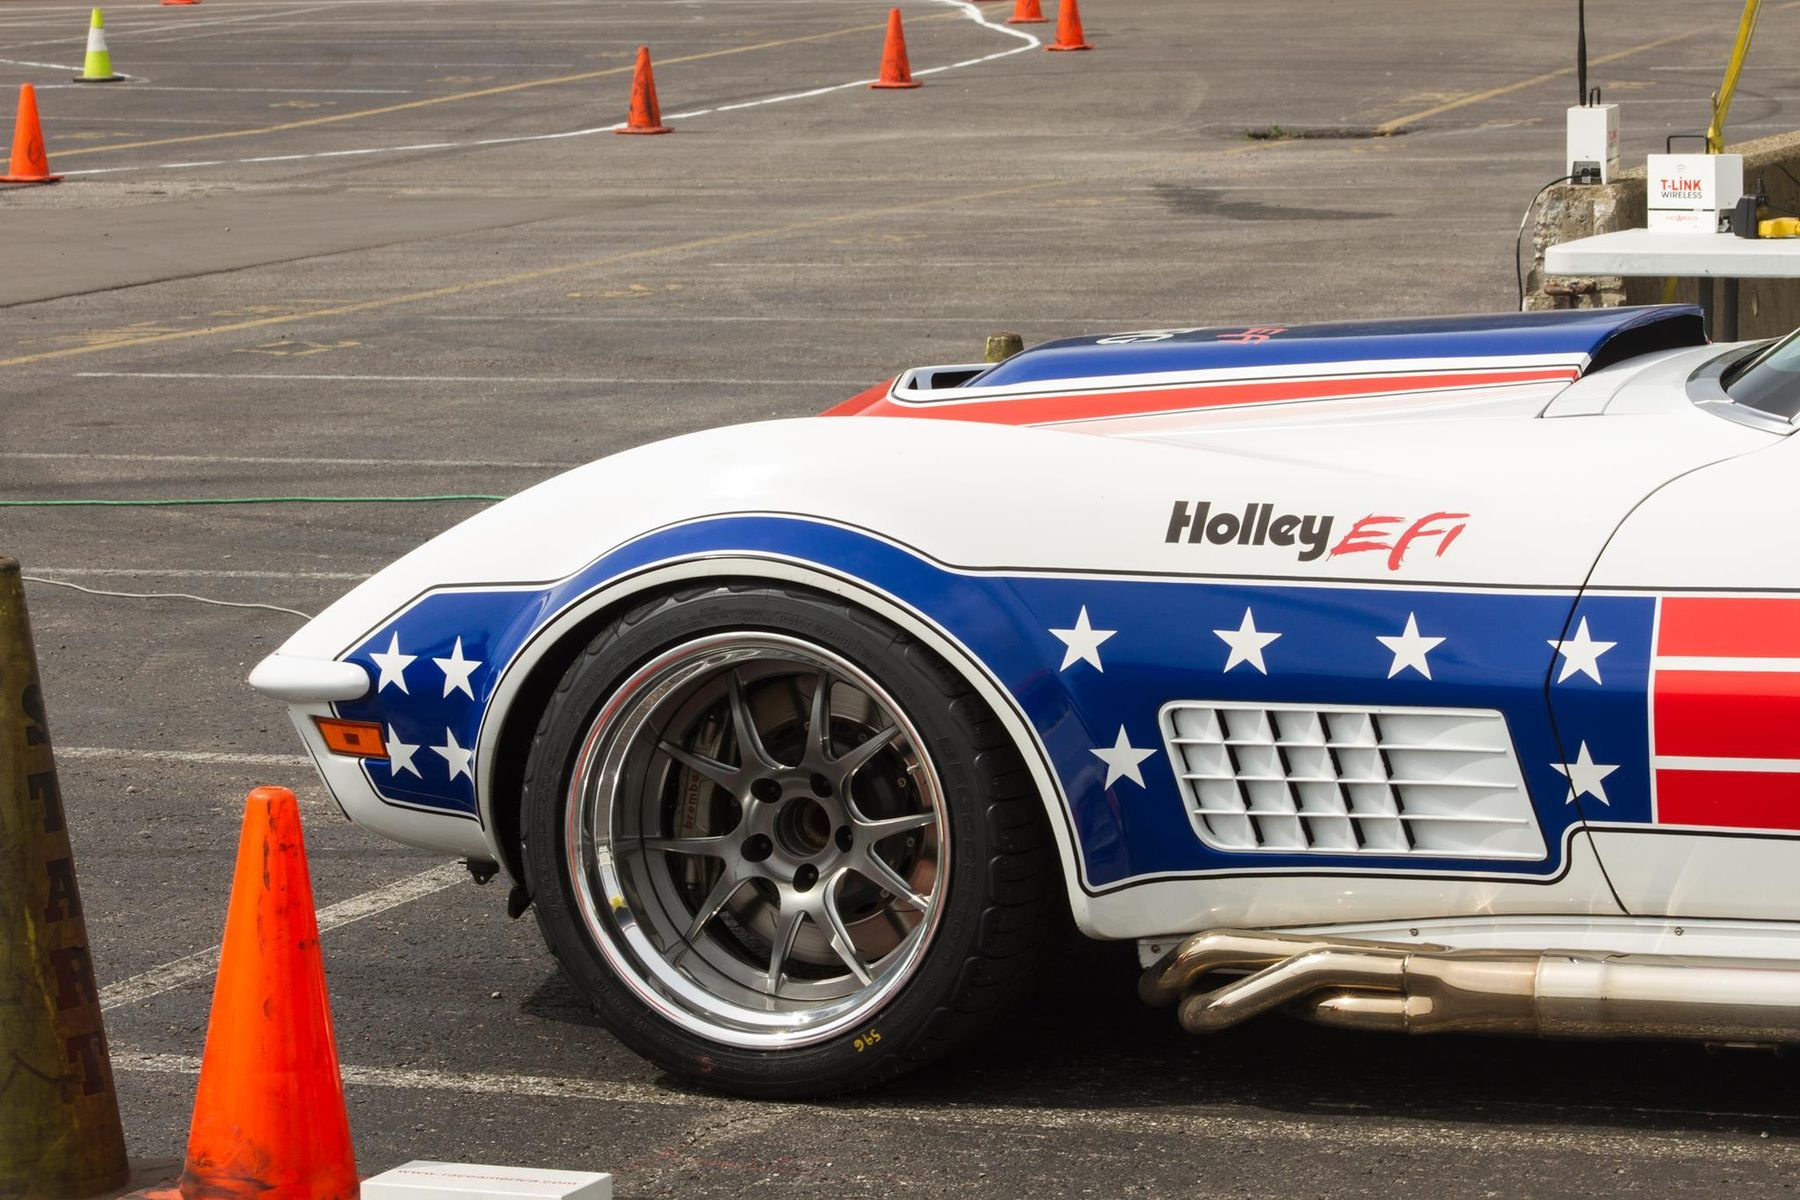 1972 Chevrolet Corvette Stingray | Ryan Mathews Wins Goodguys Nashville Nationals Autocross Shootout on Forgeline GA3 Wheels